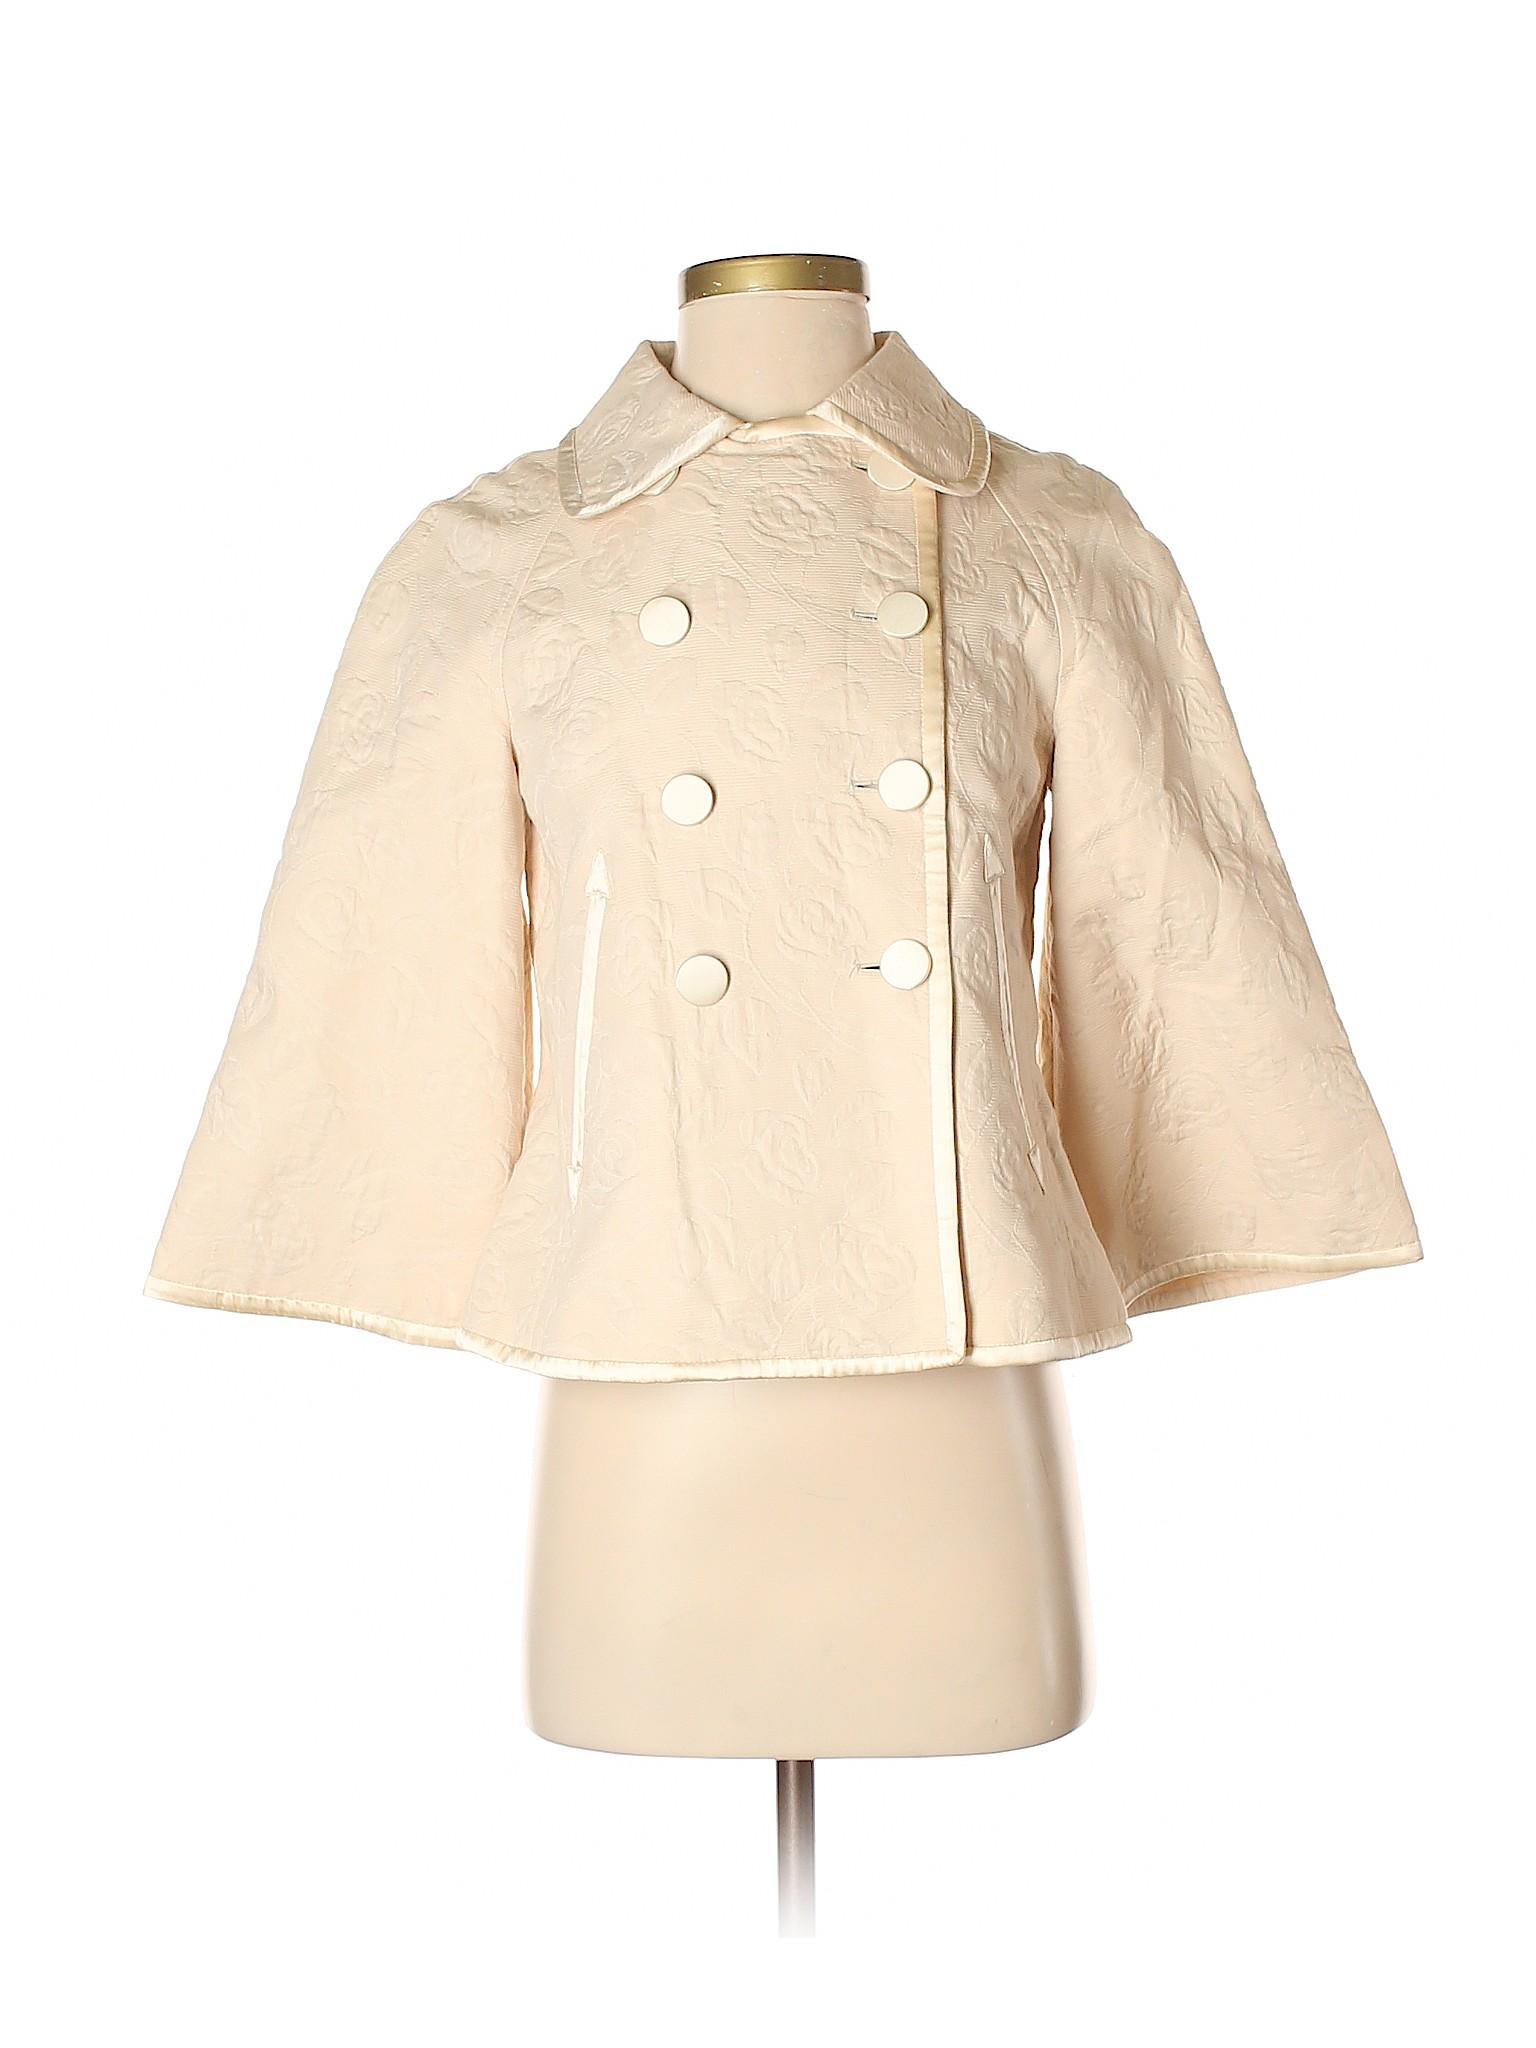 Taylor Jacket Jacket Jacket Rebecca Boutique Taylor Boutique Rebecca Boutique Rebecca Taylor qEwdBZnI